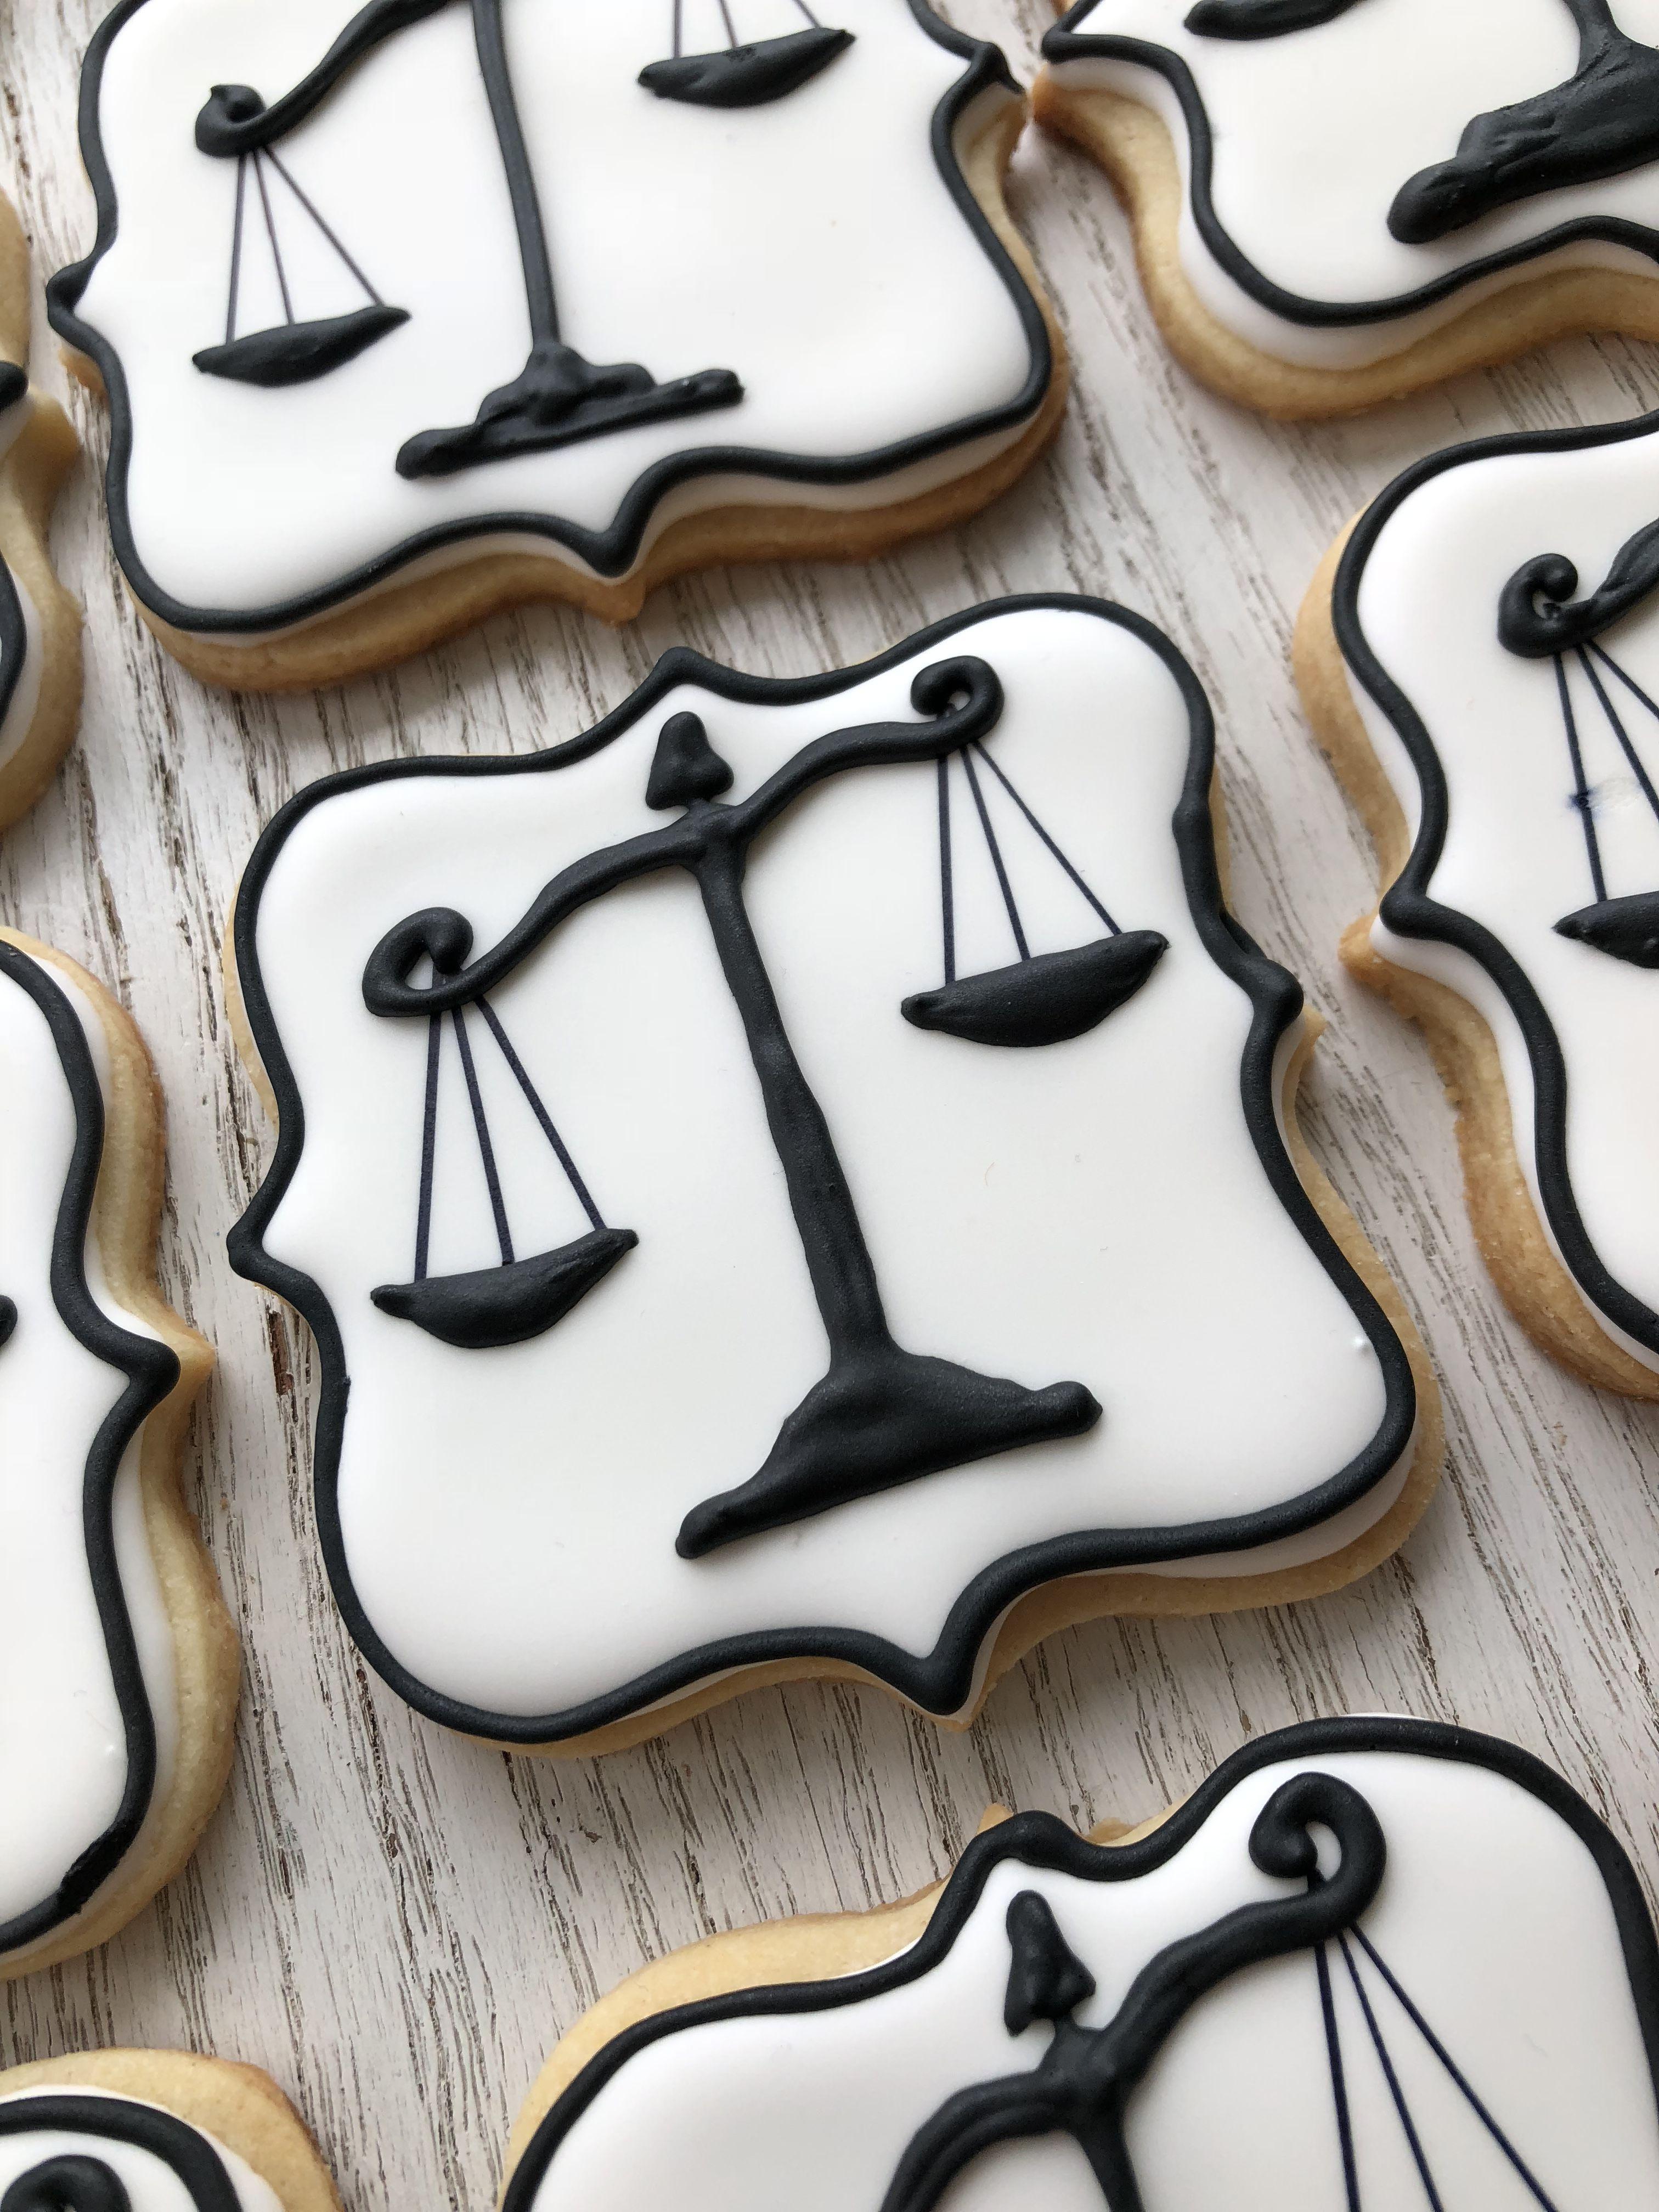 Kelly's scales of justice cookies | Graduation cookies ...